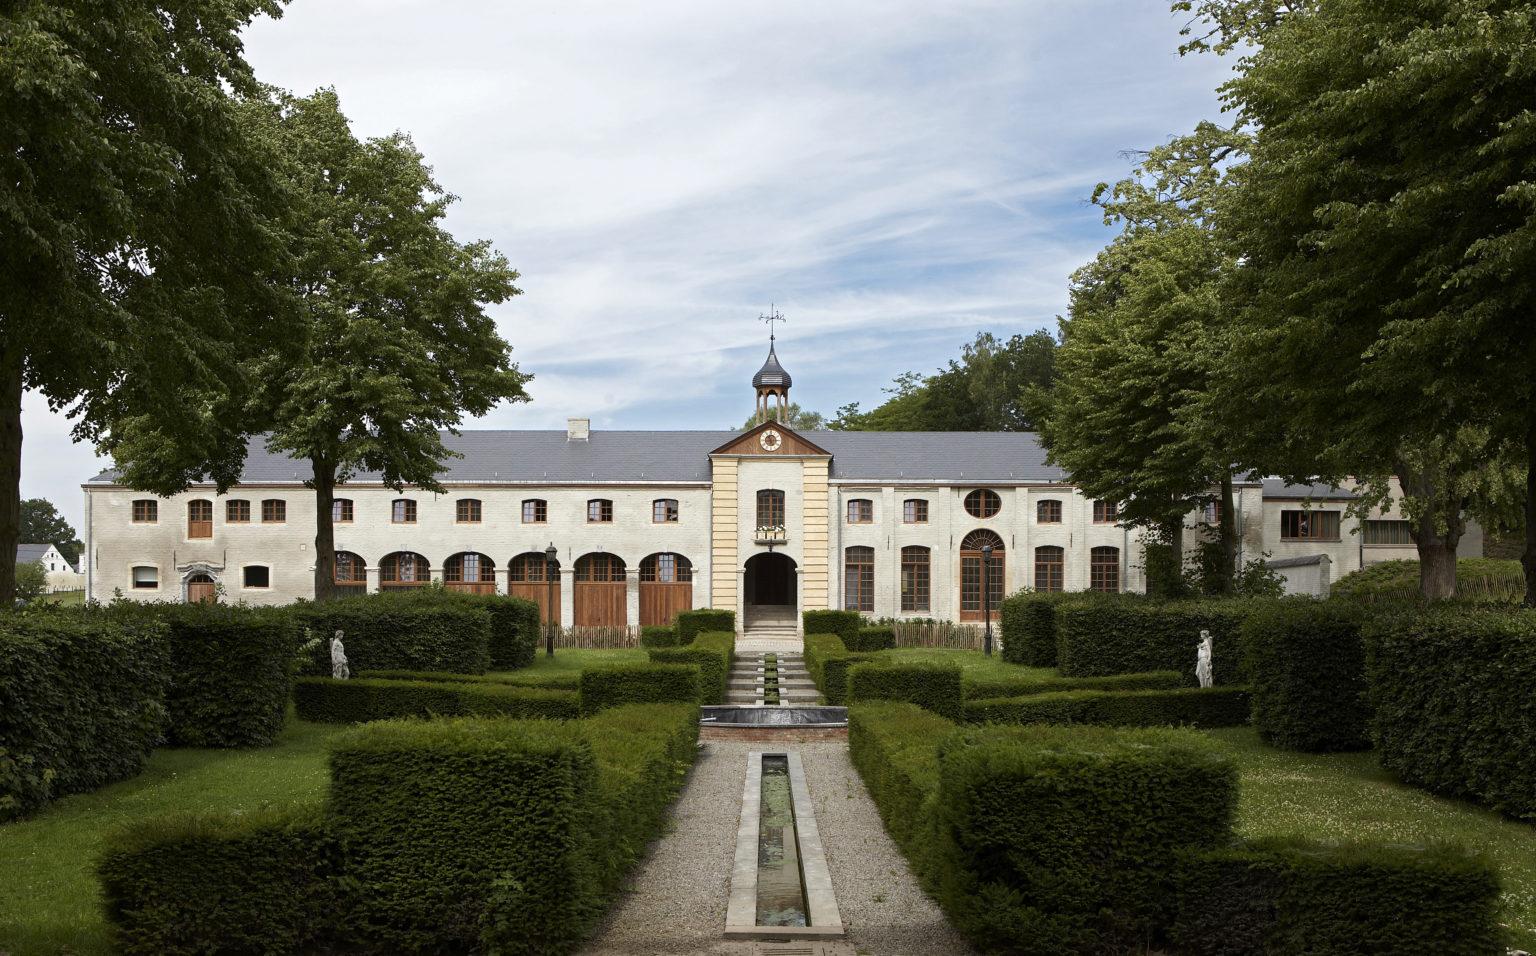 B&B Baron's House Leuven